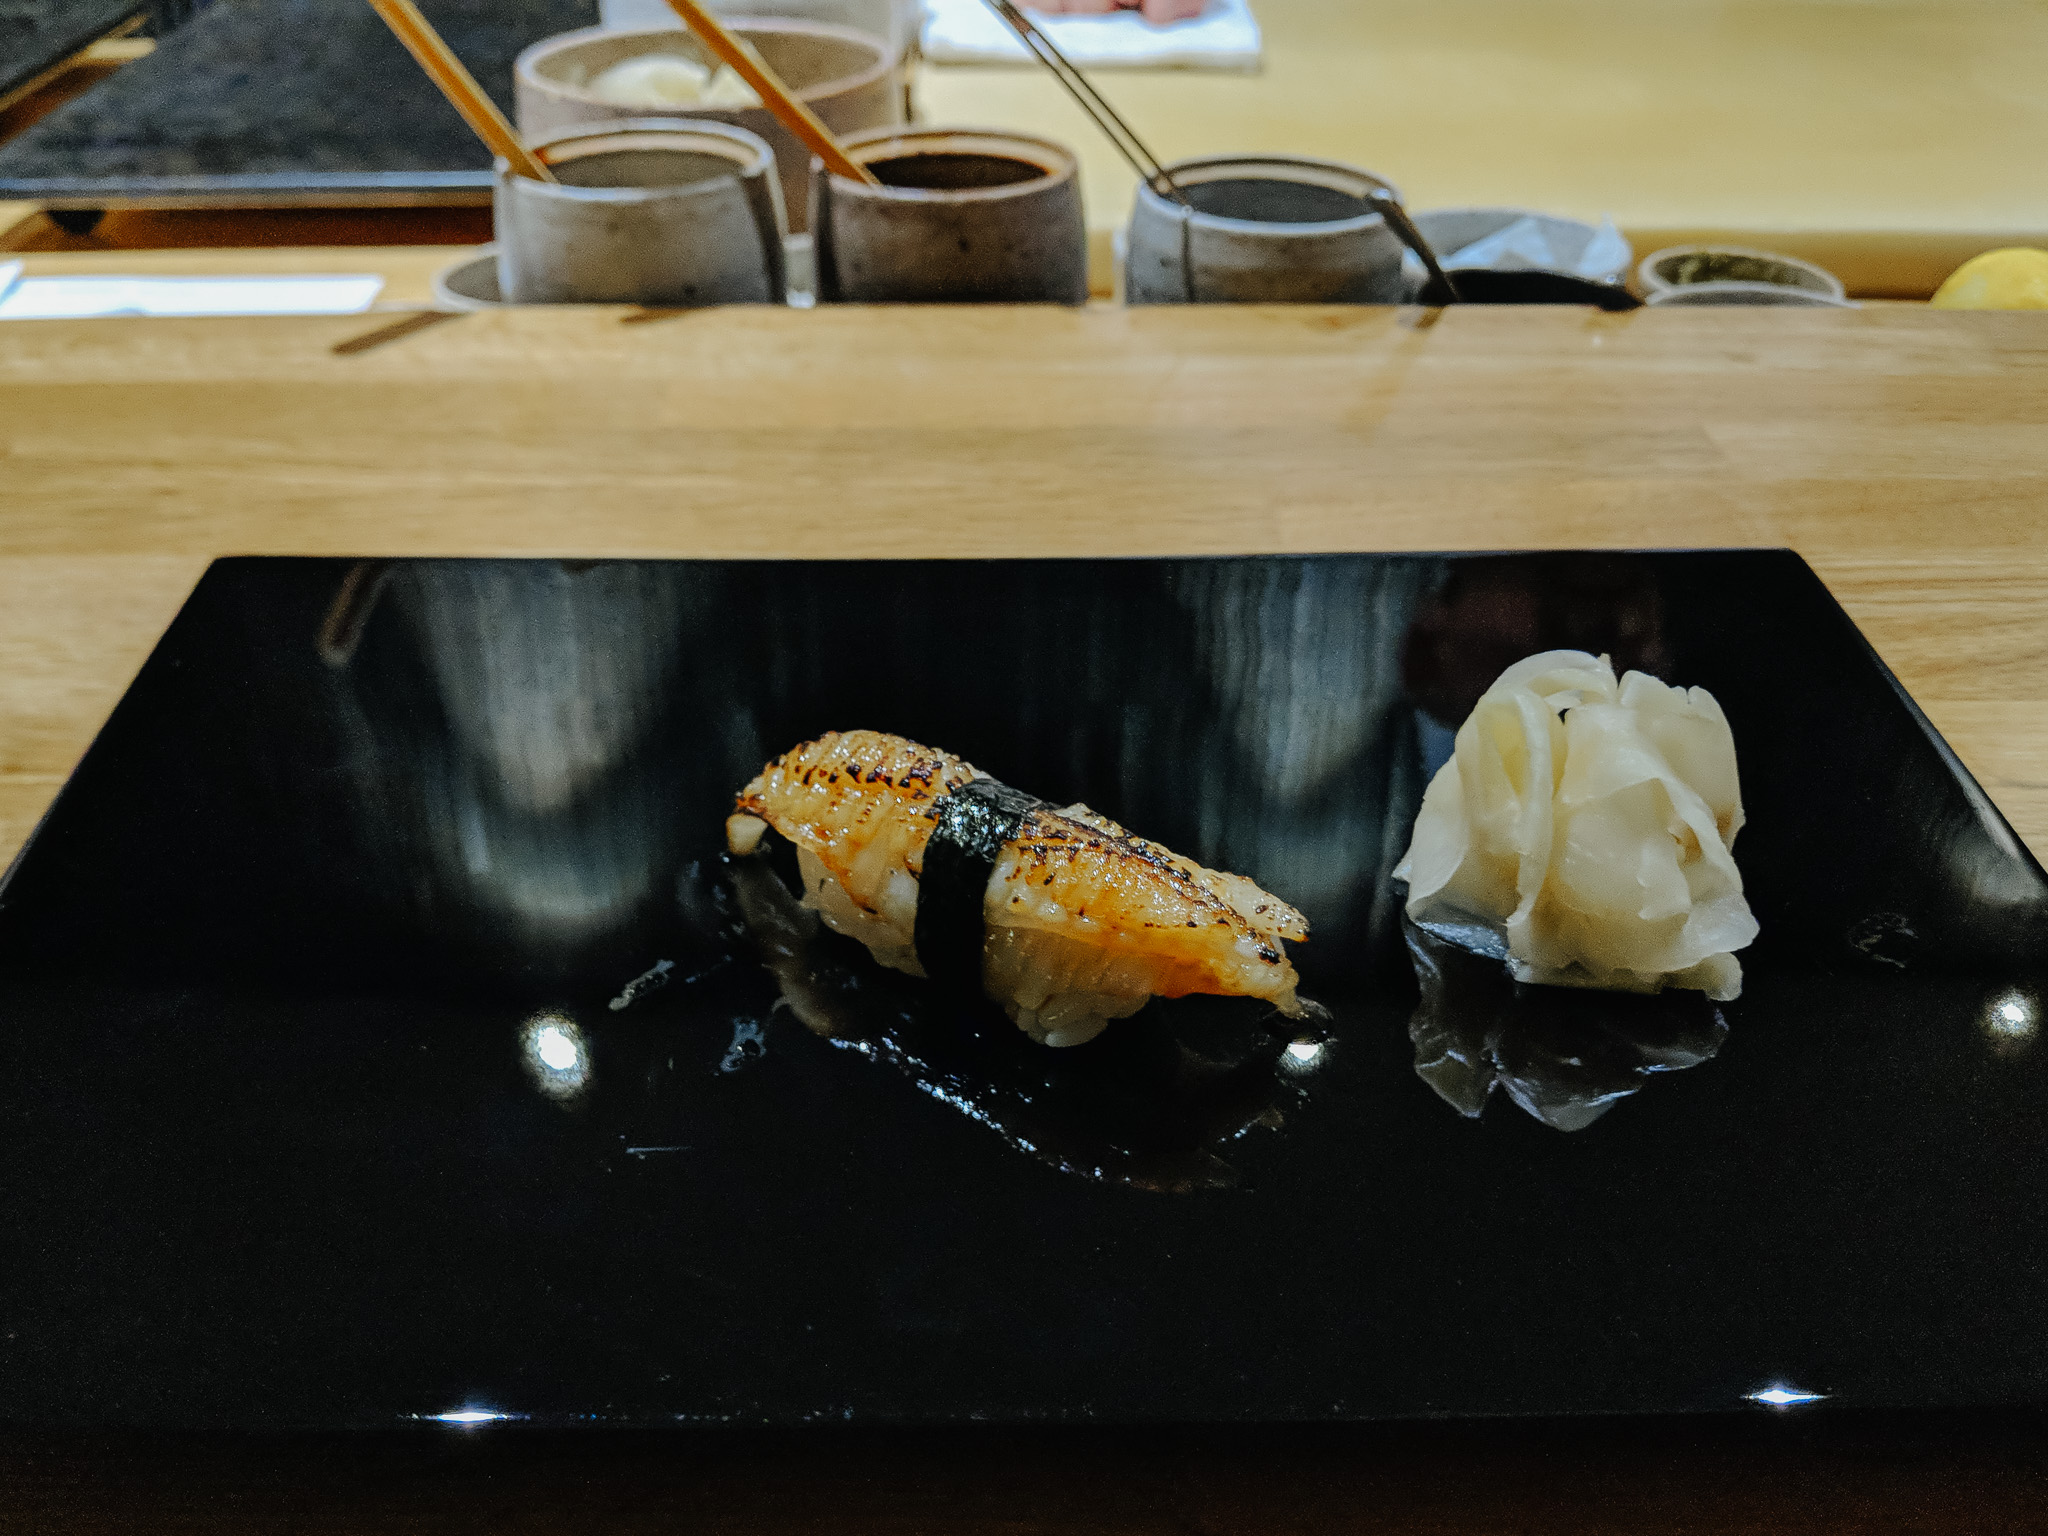 minamishima-melbourne-food-photographer-007.JPG